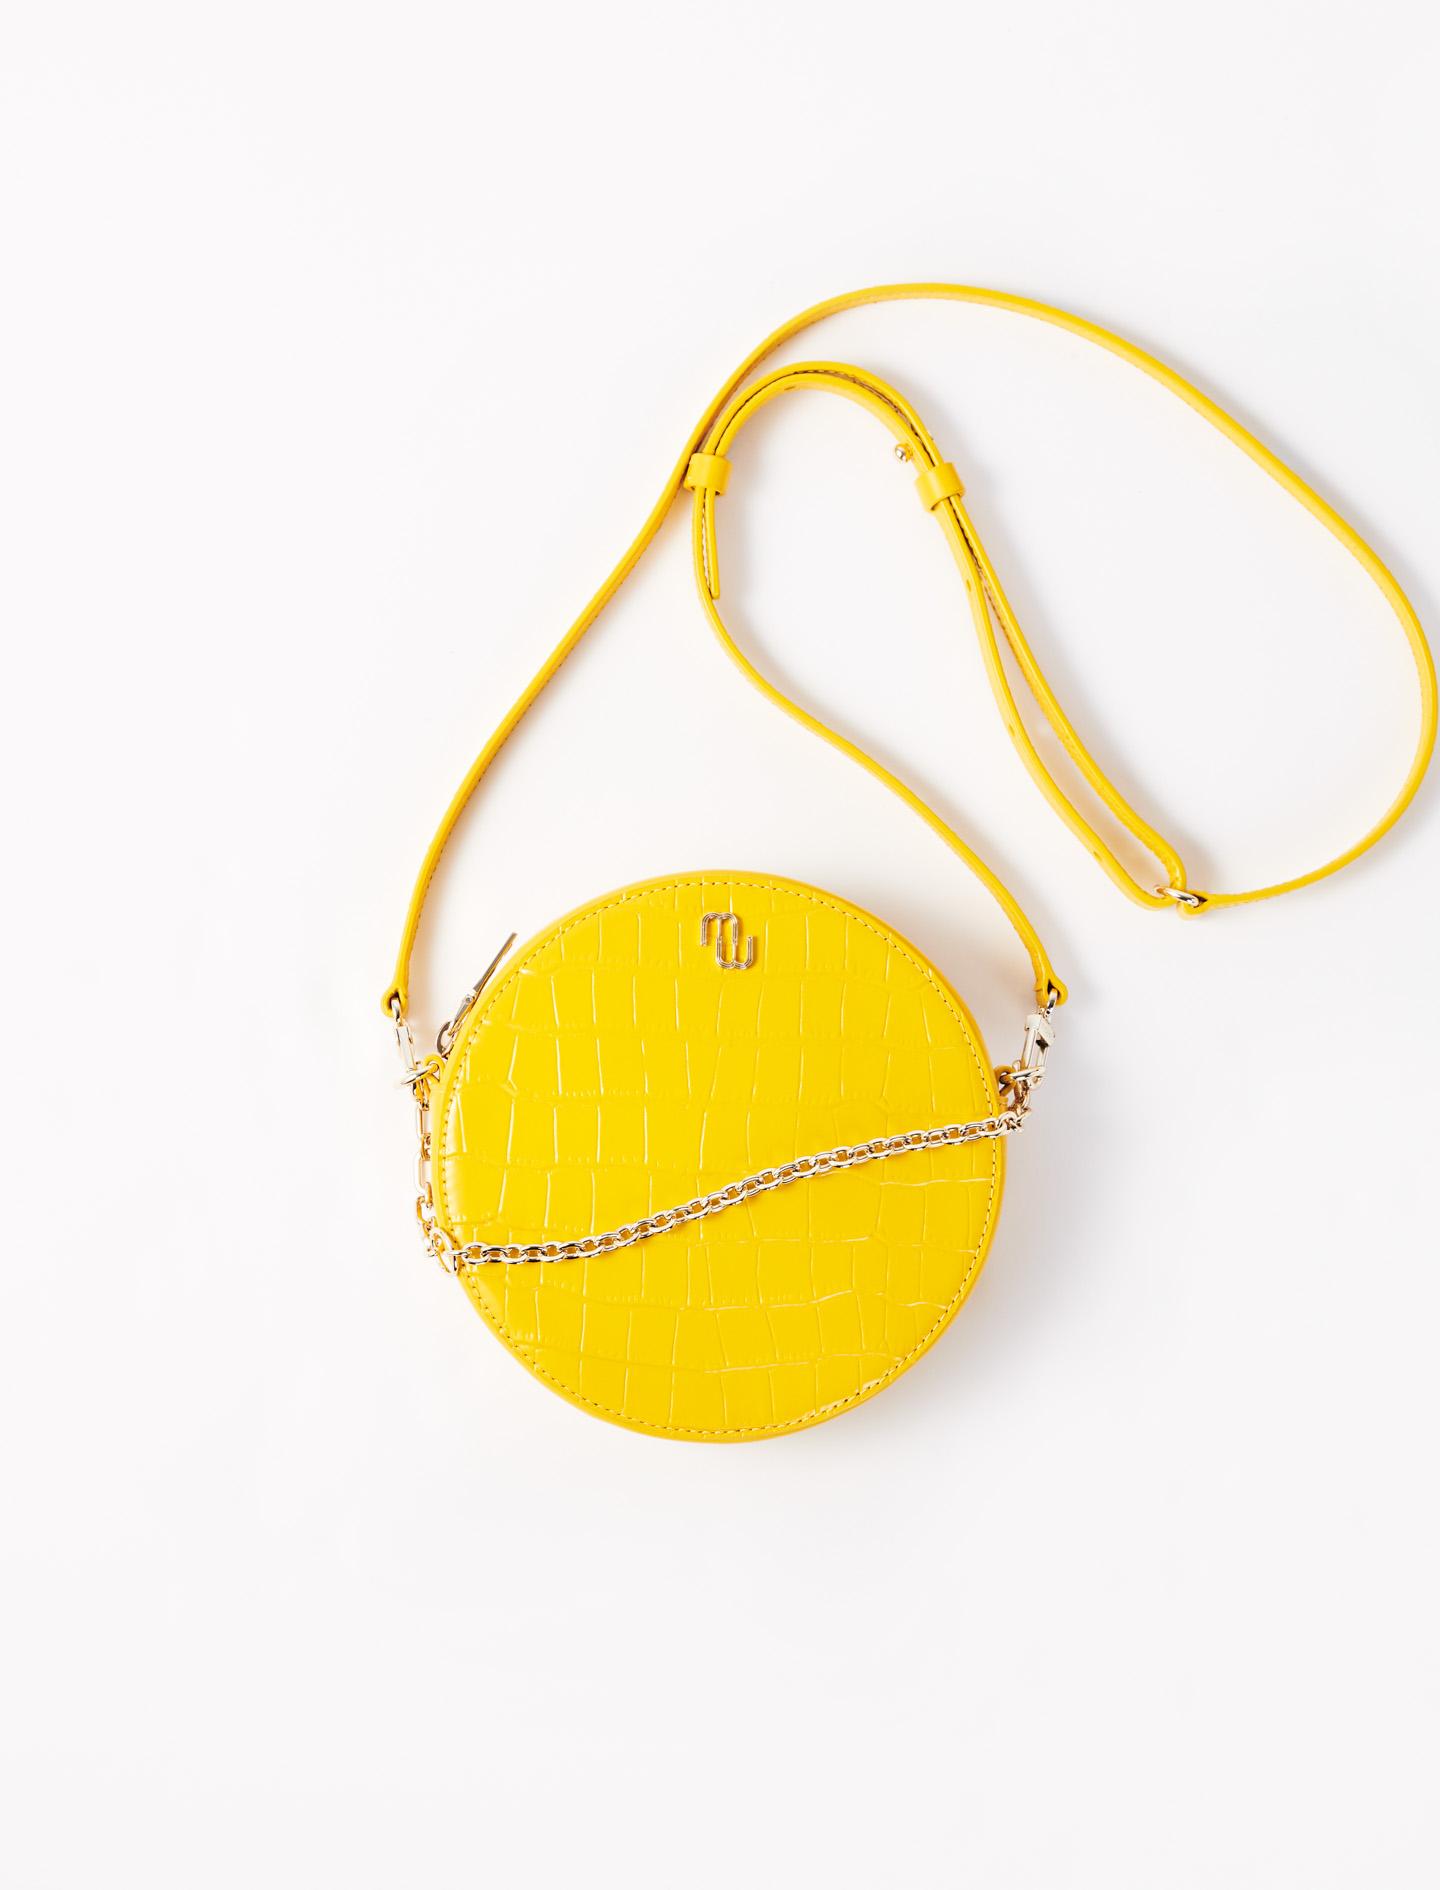 Round Embossed Leather Handbag - Yellow